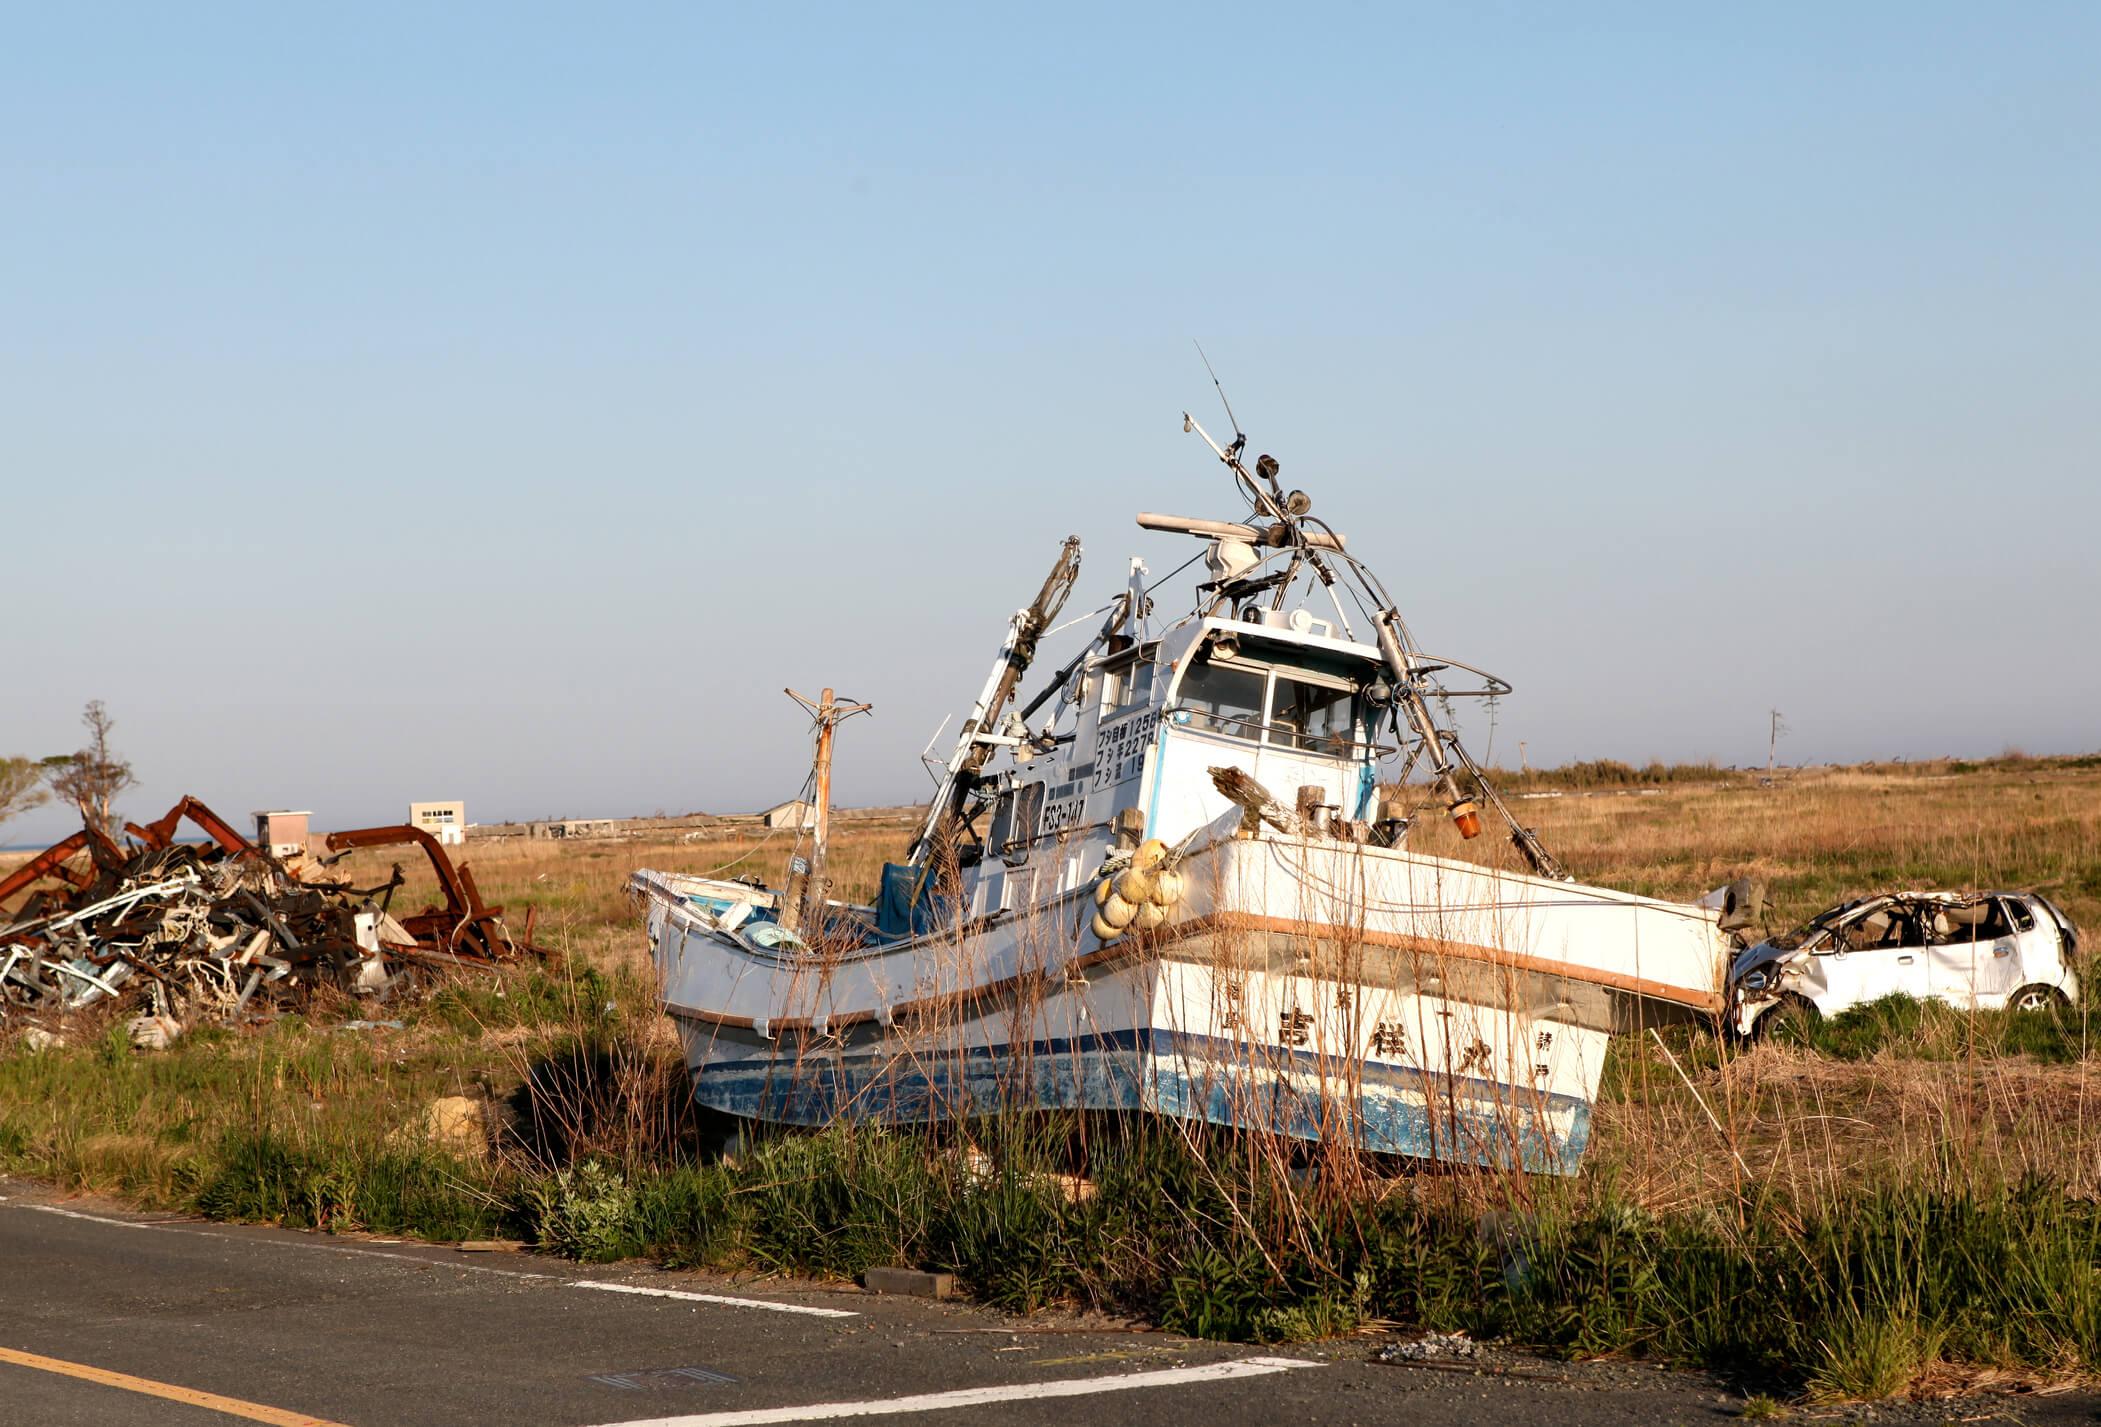 aftermath of tsunami in 3/11 Tohoku Japan